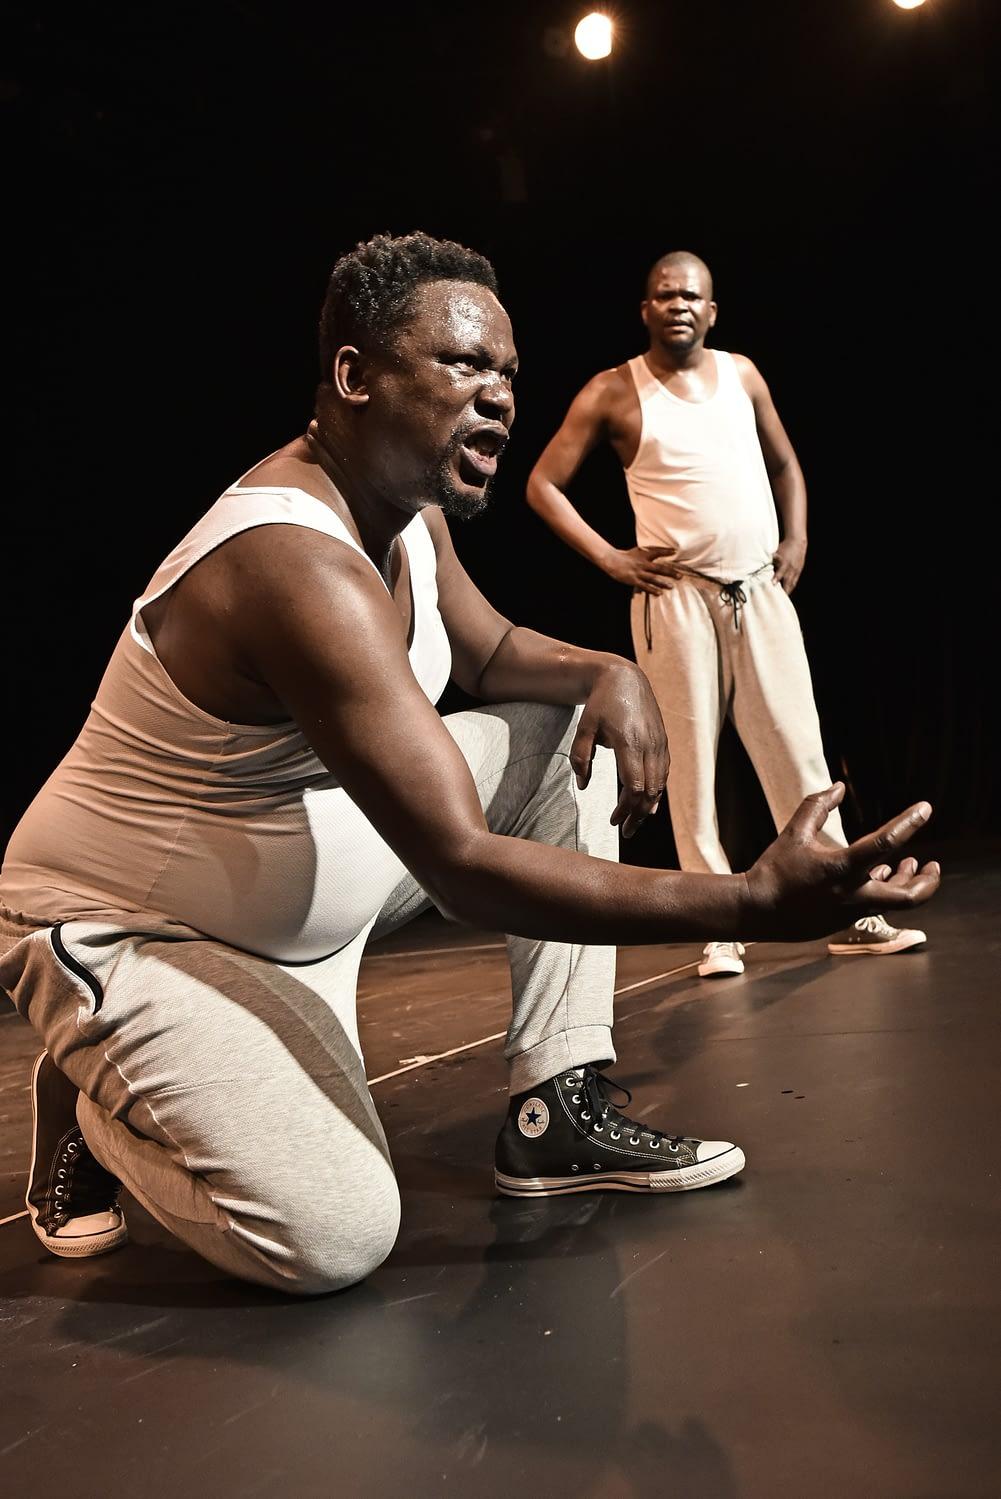 Vuka Machel featuring Mcendisi Shabangu and Xolile Gama at the Joburg Theatre (Photo by Mariola Biela)